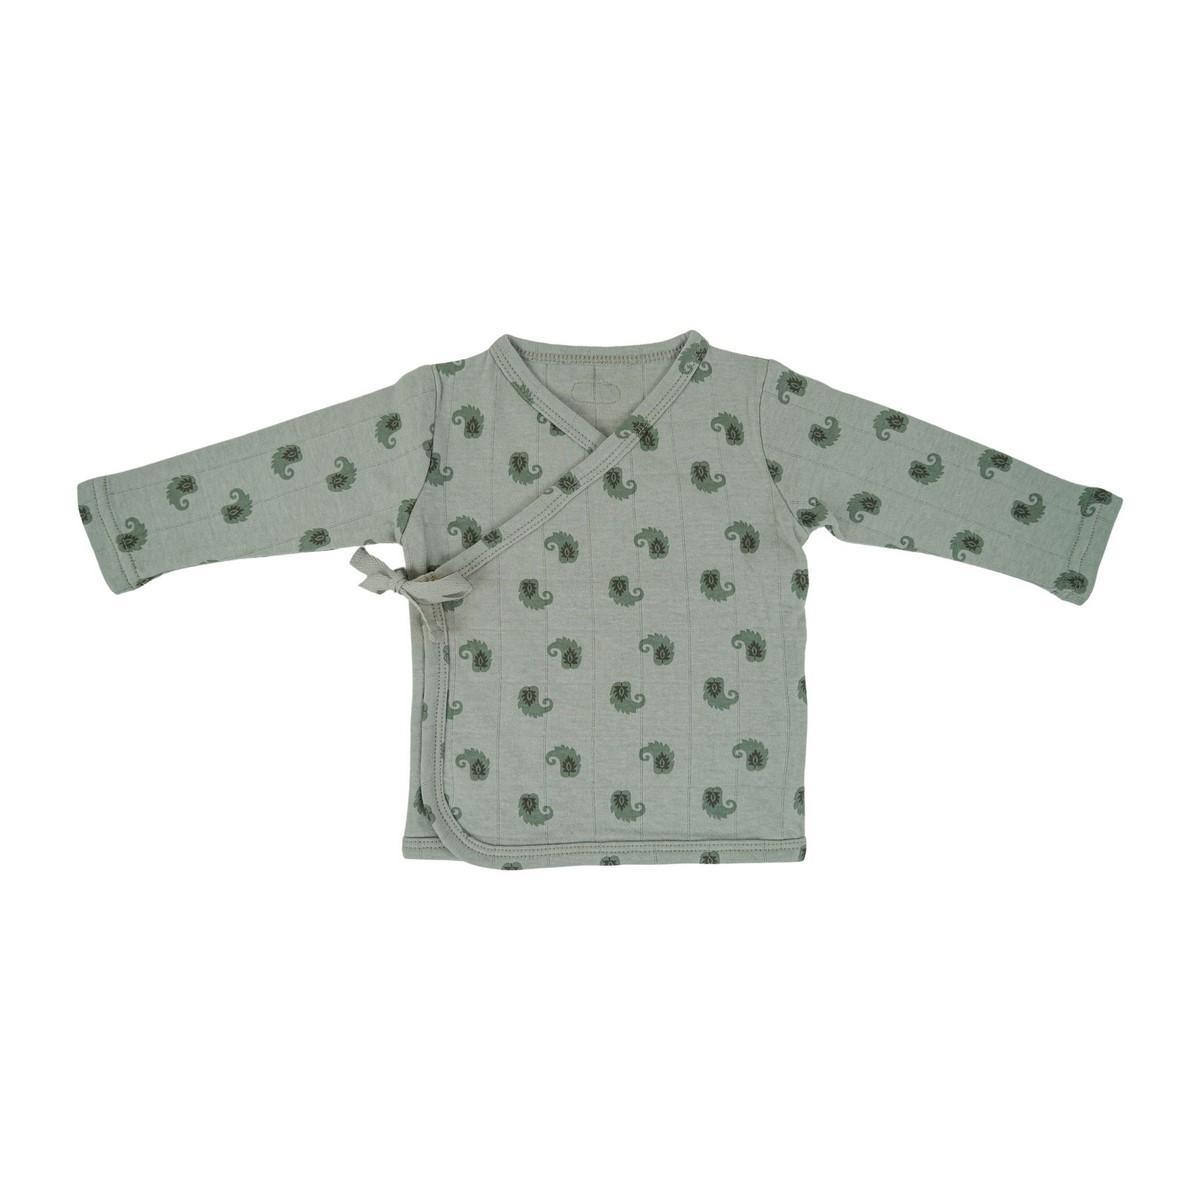 LODGER Kabátik detský s dlhými rukávmi Topper Flame Tribe Silt Green veľ. 62